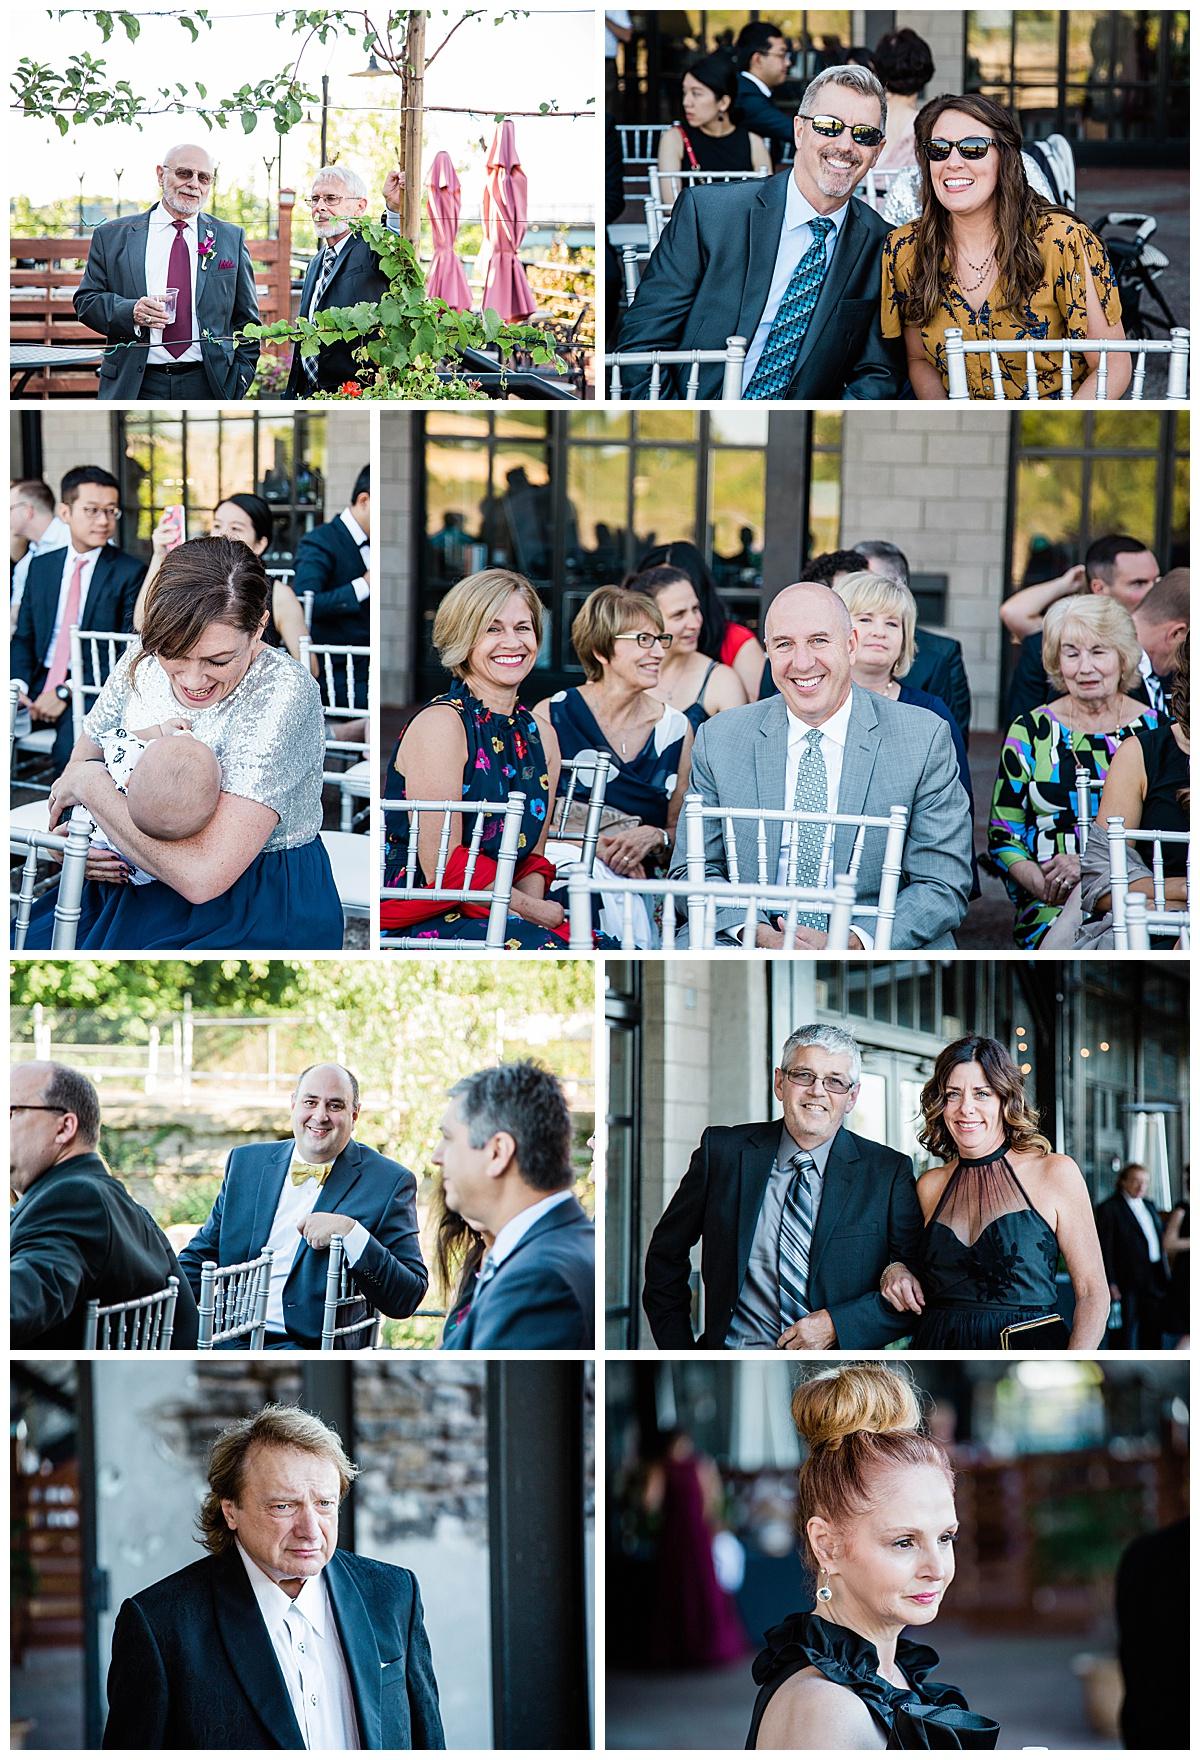 lou gramm - Lonsberry wedding